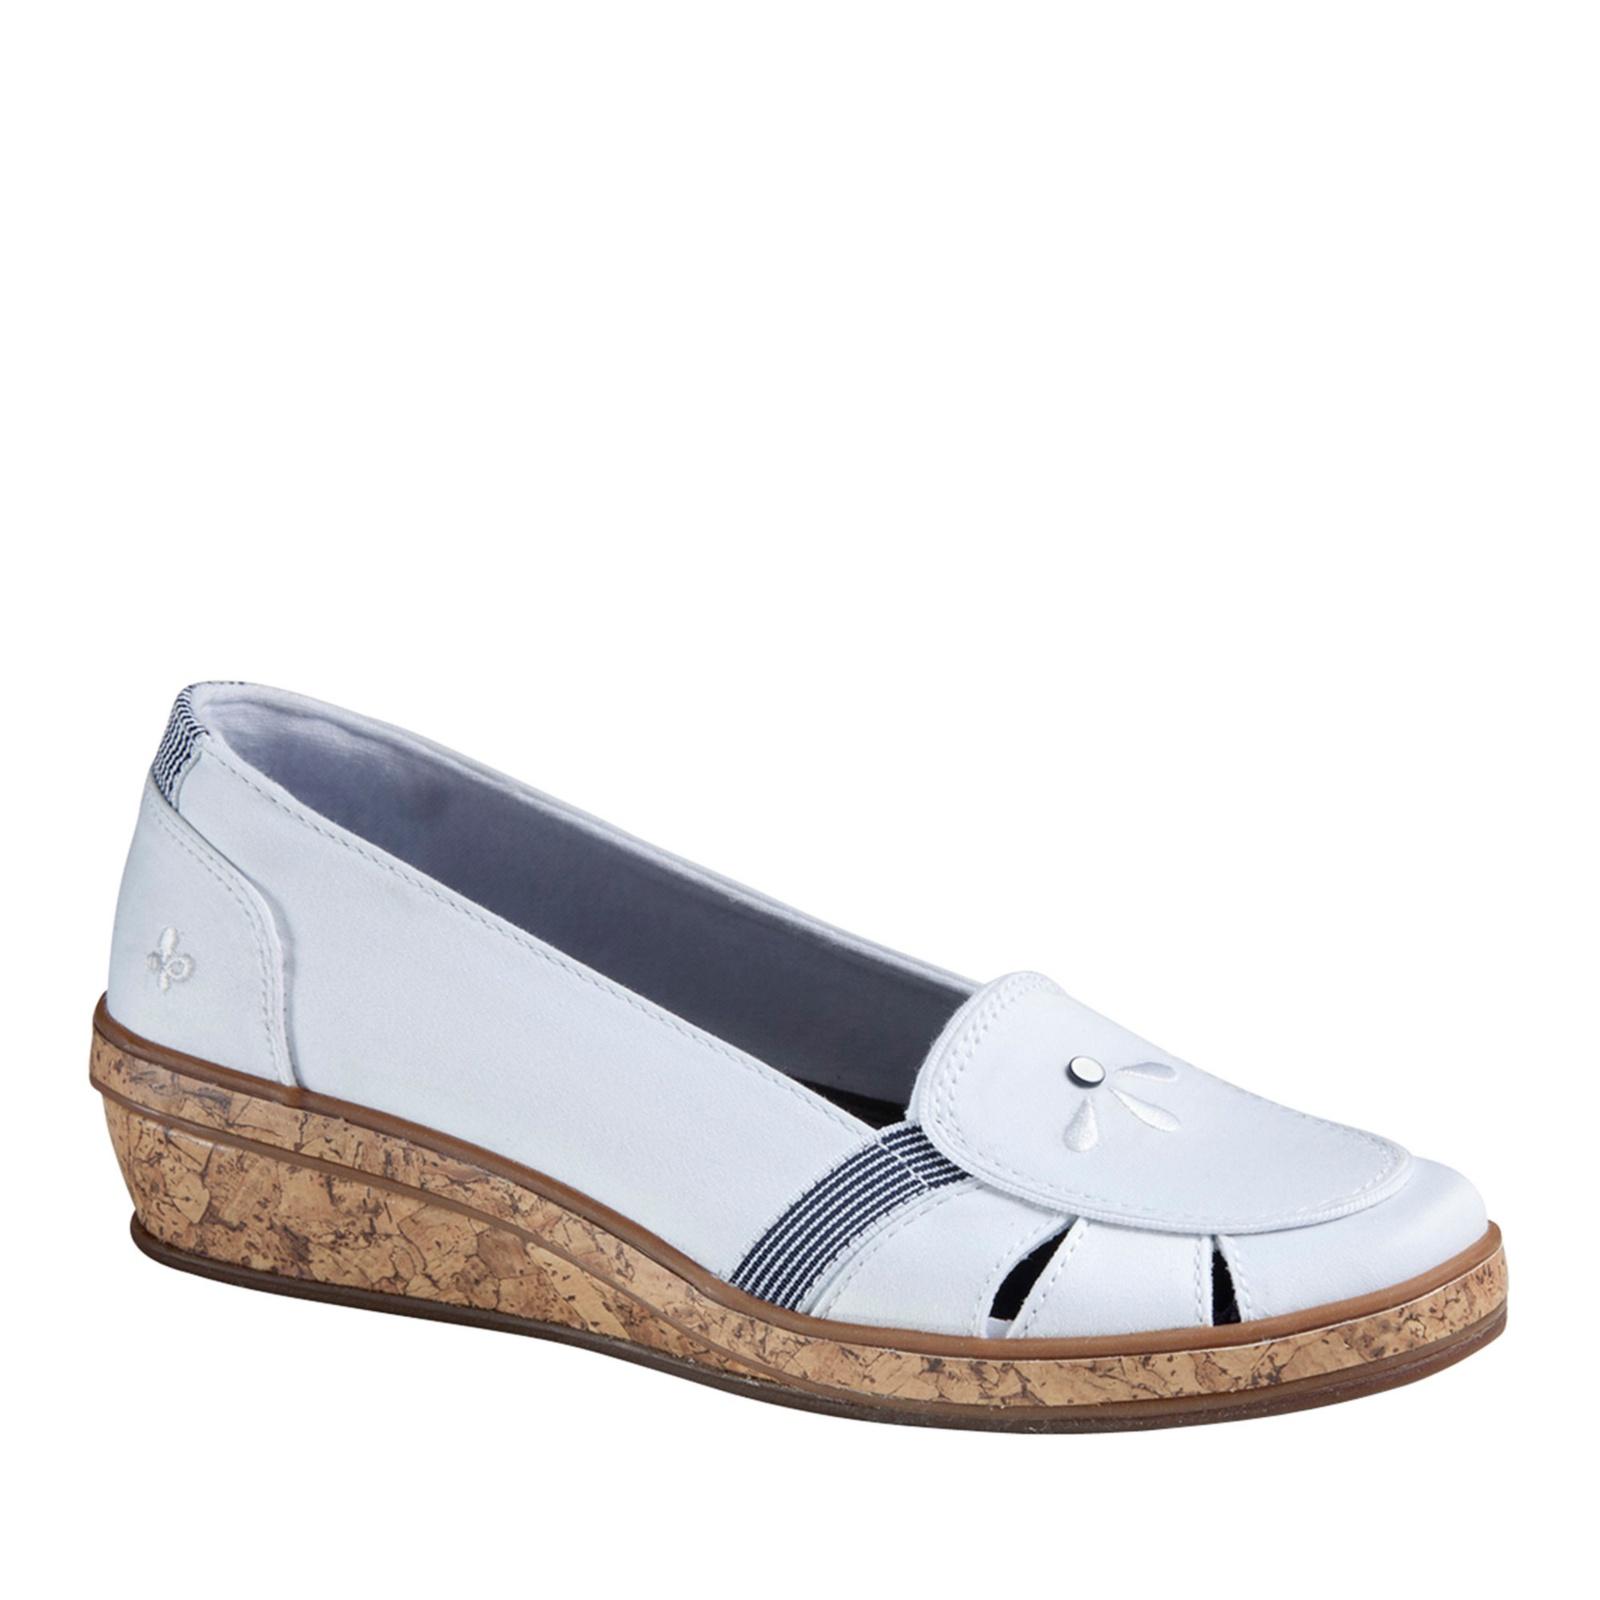 Grasshopper Shoes Wide Width